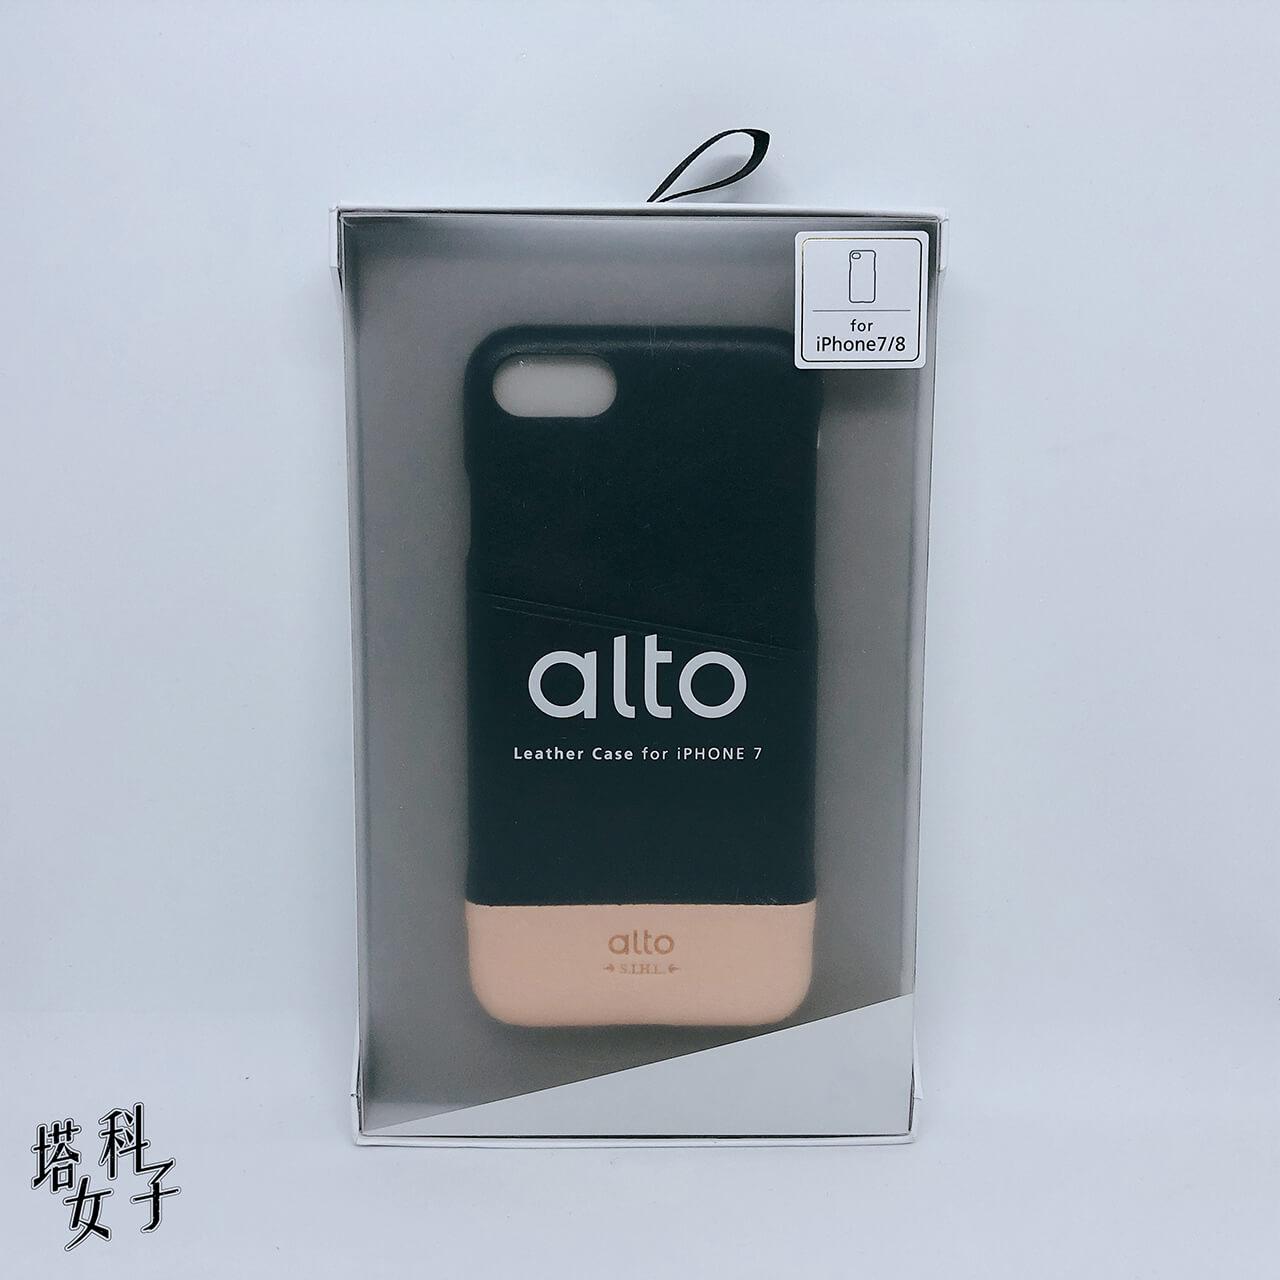 iPhone 手機殼開箱 - alto